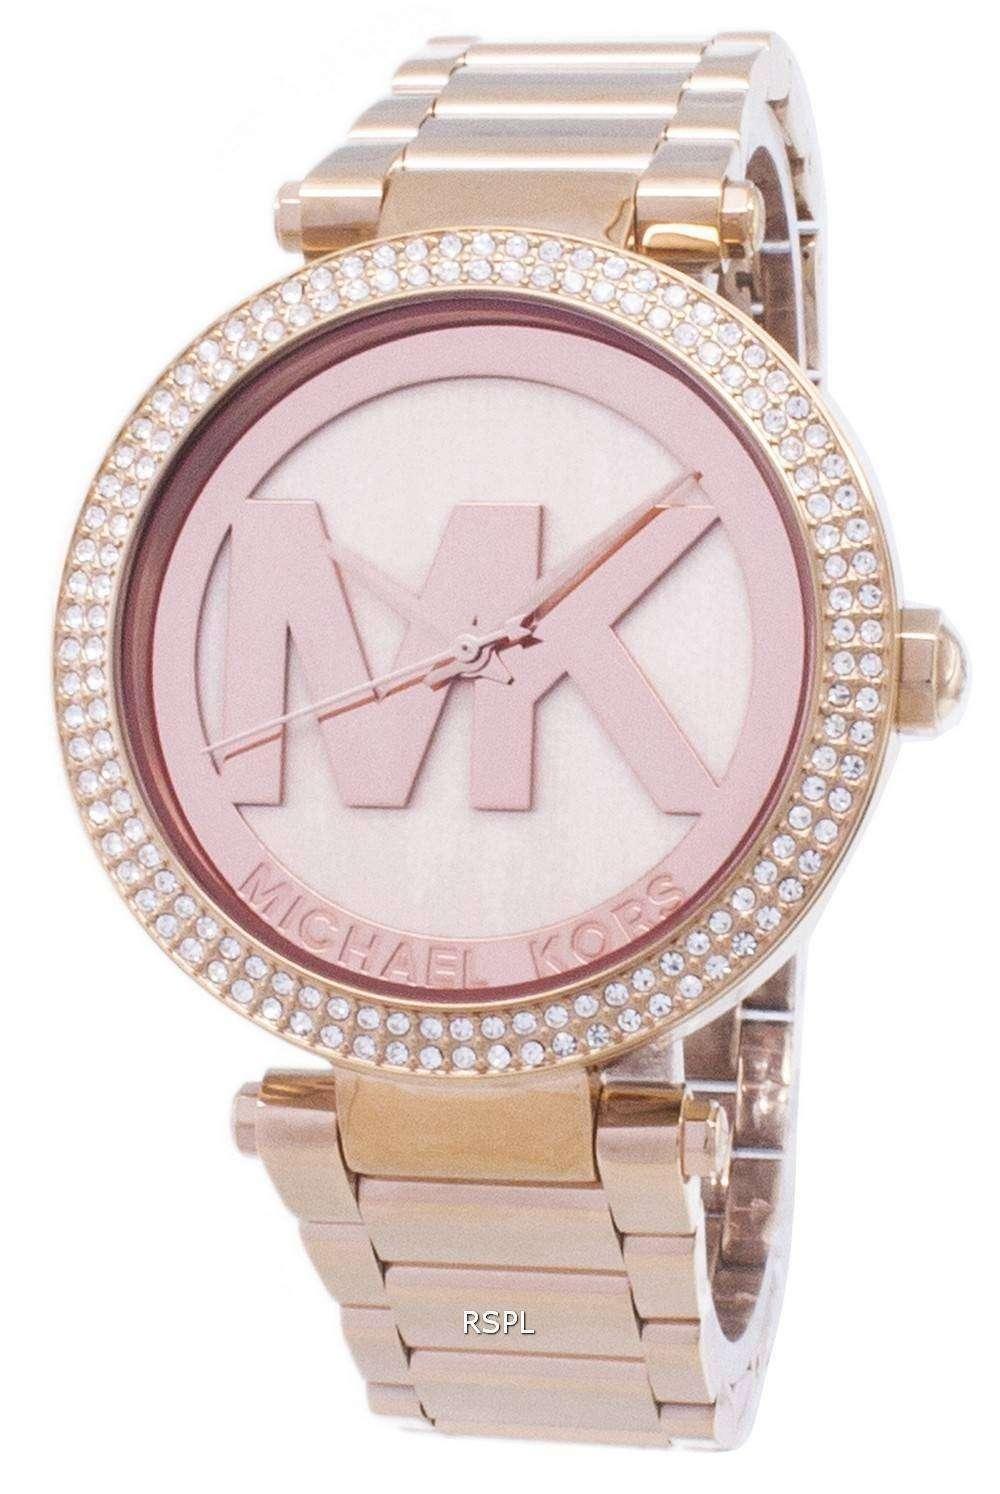 7feb442a4d2f Michael Kors Parker Crystals MK5865 Womens Watch - CityWatches.co.uk